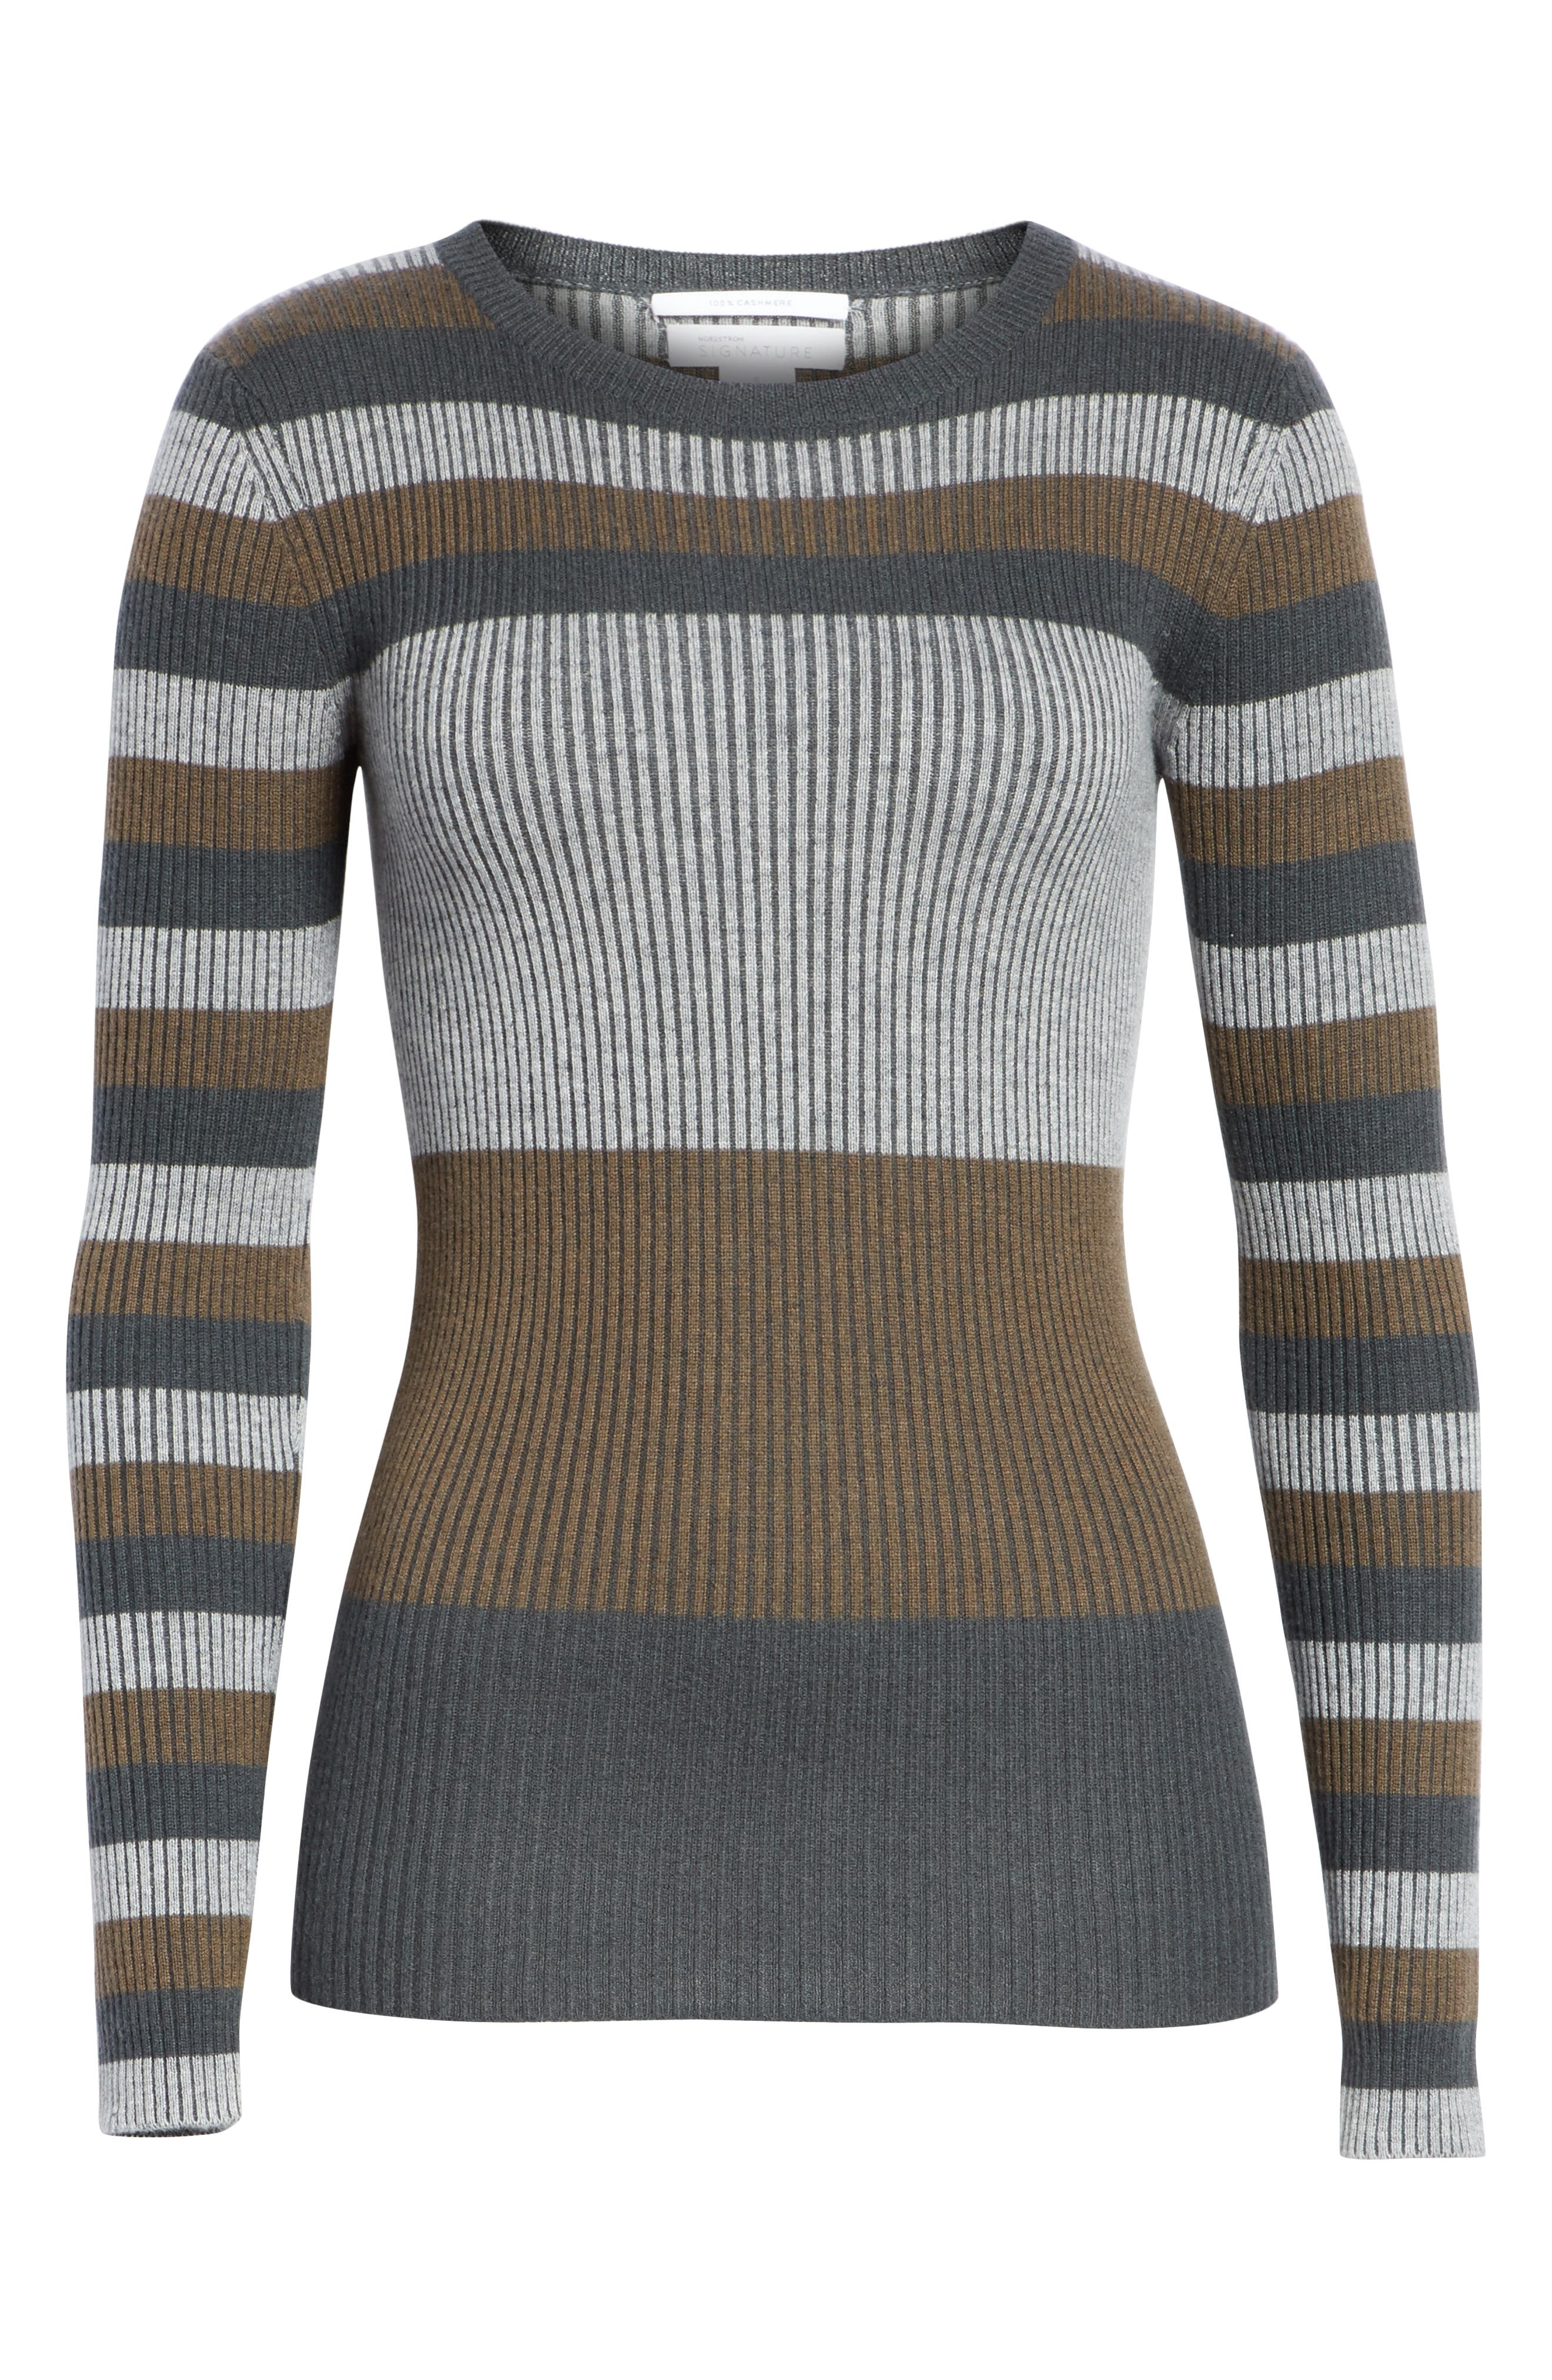 NORDSTROM SIGNATURE,                             Stripe Cashmere Sweater,                             Alternate thumbnail 6, color,                             315